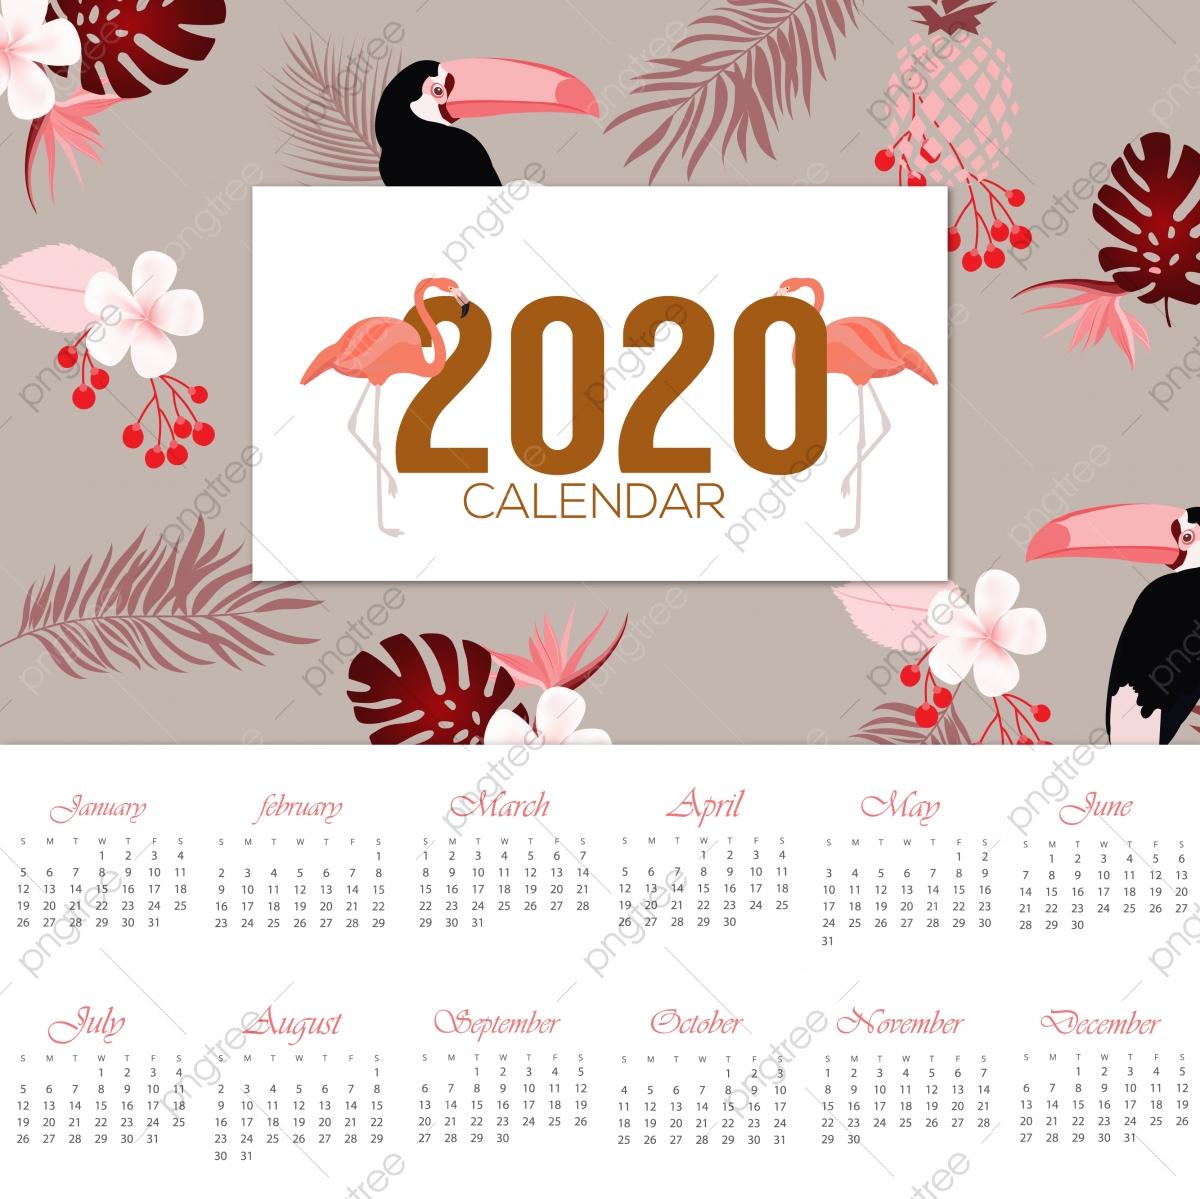 2020 Calendar Design, Calendar, Christmas, Illustration Png inside Festive Printable Calendar 2020